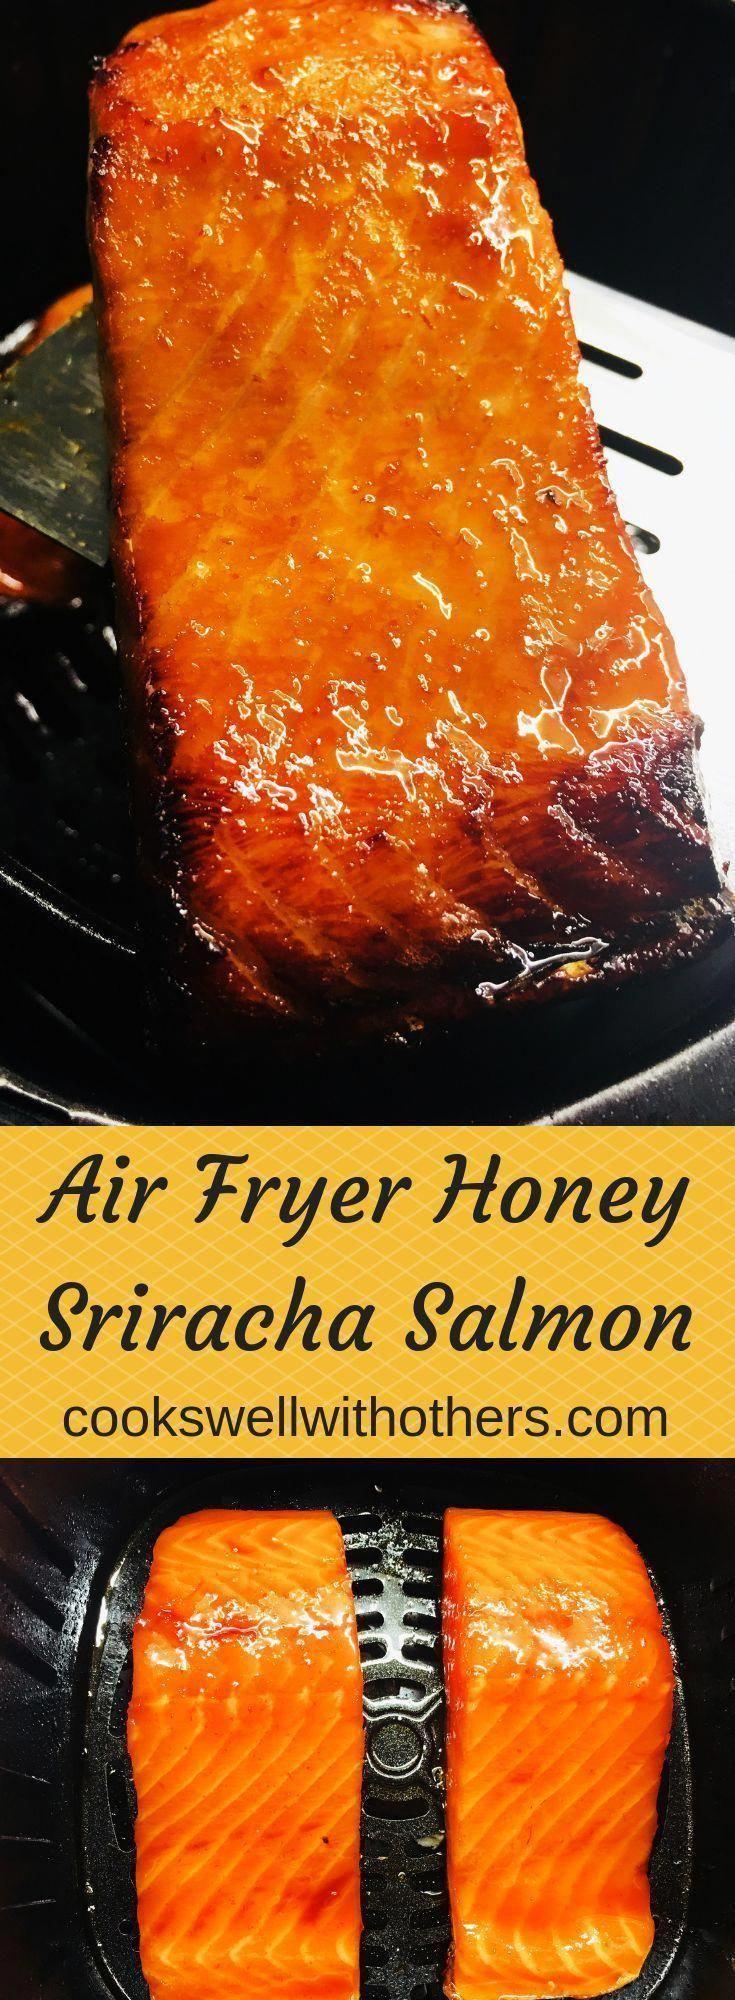 Air Fryer Recipes Salmon, Air Fryer Oven Recipes, Air Frier Recipes, Air Fryer Dinner Recipes, Easy Appetizer Recipes, Salmon In Air Fryer, Baked Salmon Recipes, Cooking Tips, Cooking Recipes